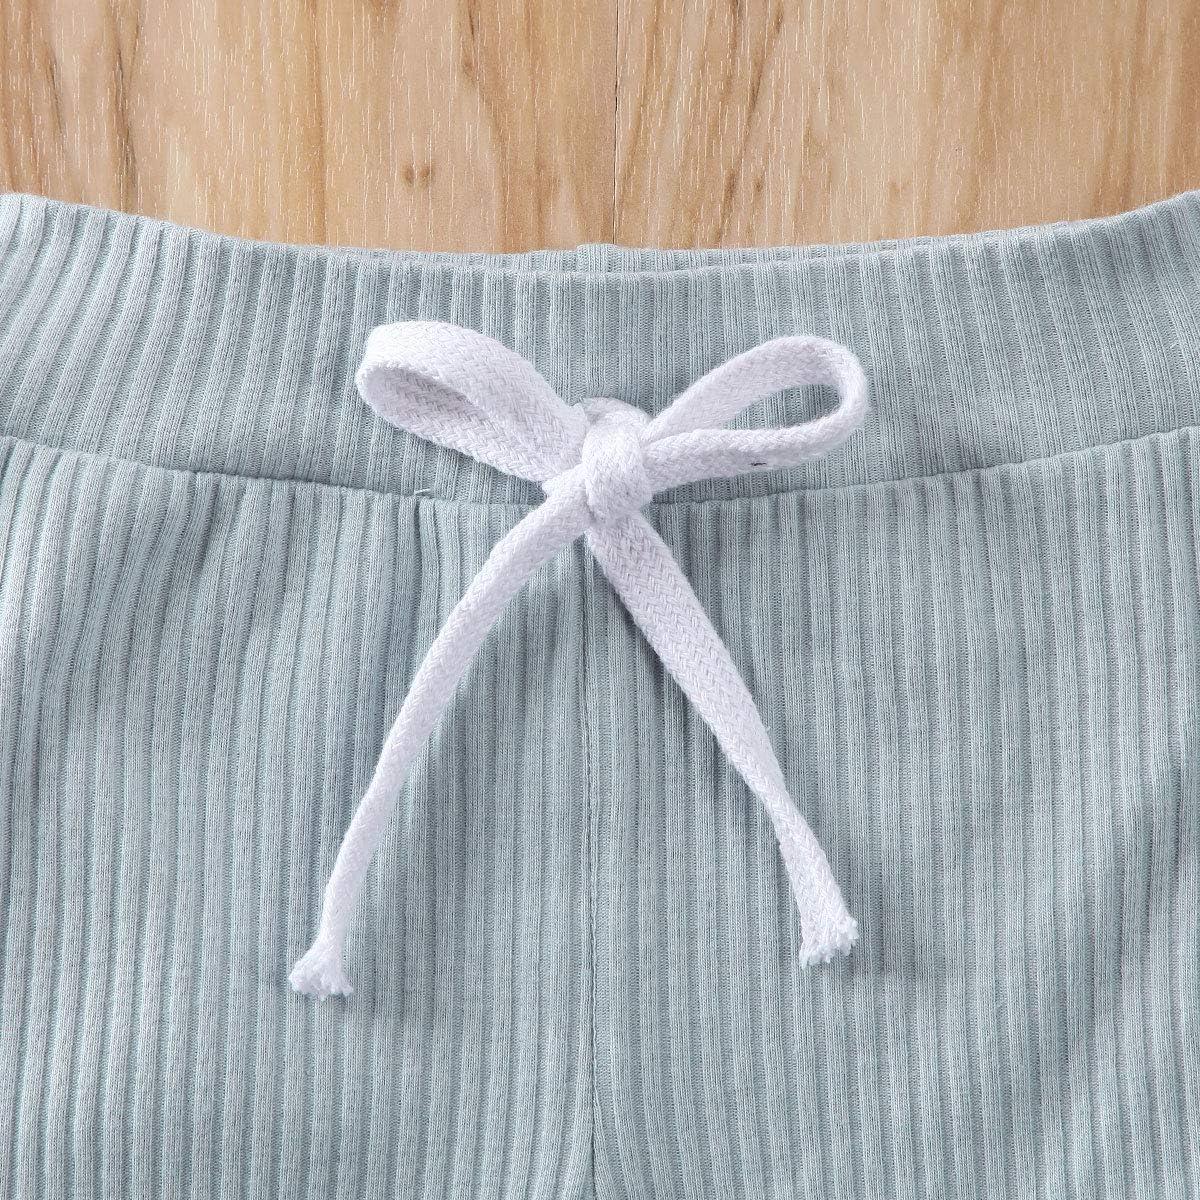 Newborn Baby Girl Boy Clothe Set Solid Short Sleeve Cotton Button Bodysuits Romper+Shorts Pant 2PCS Outfits